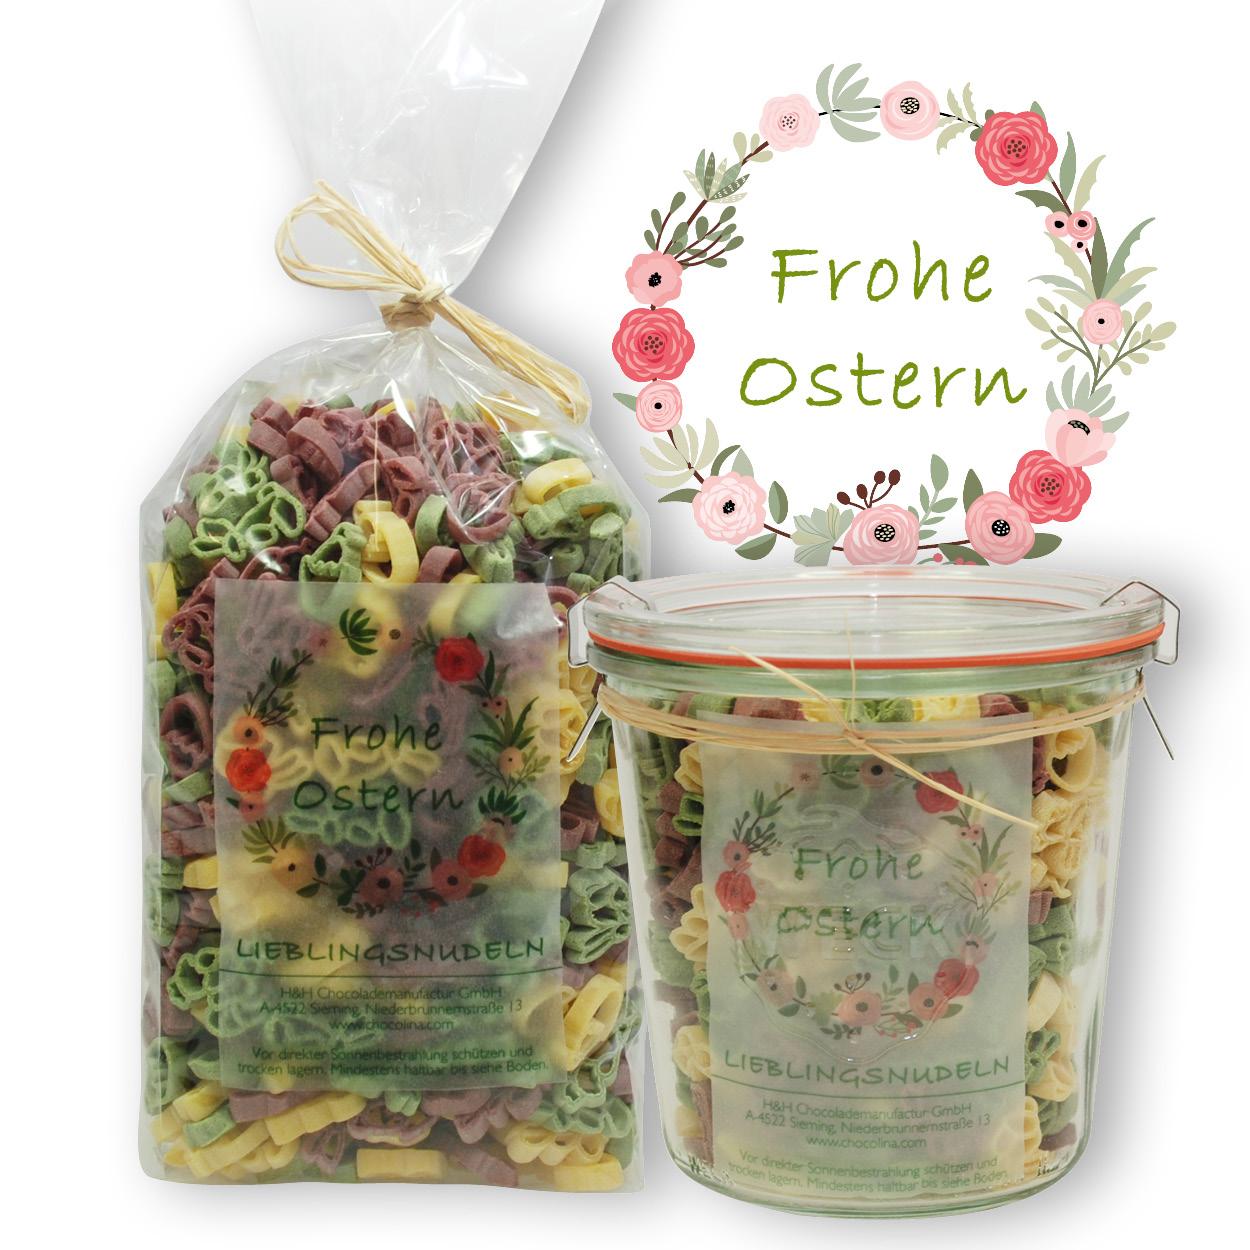 Lieblingsnudeln Mix Frohe Ostern